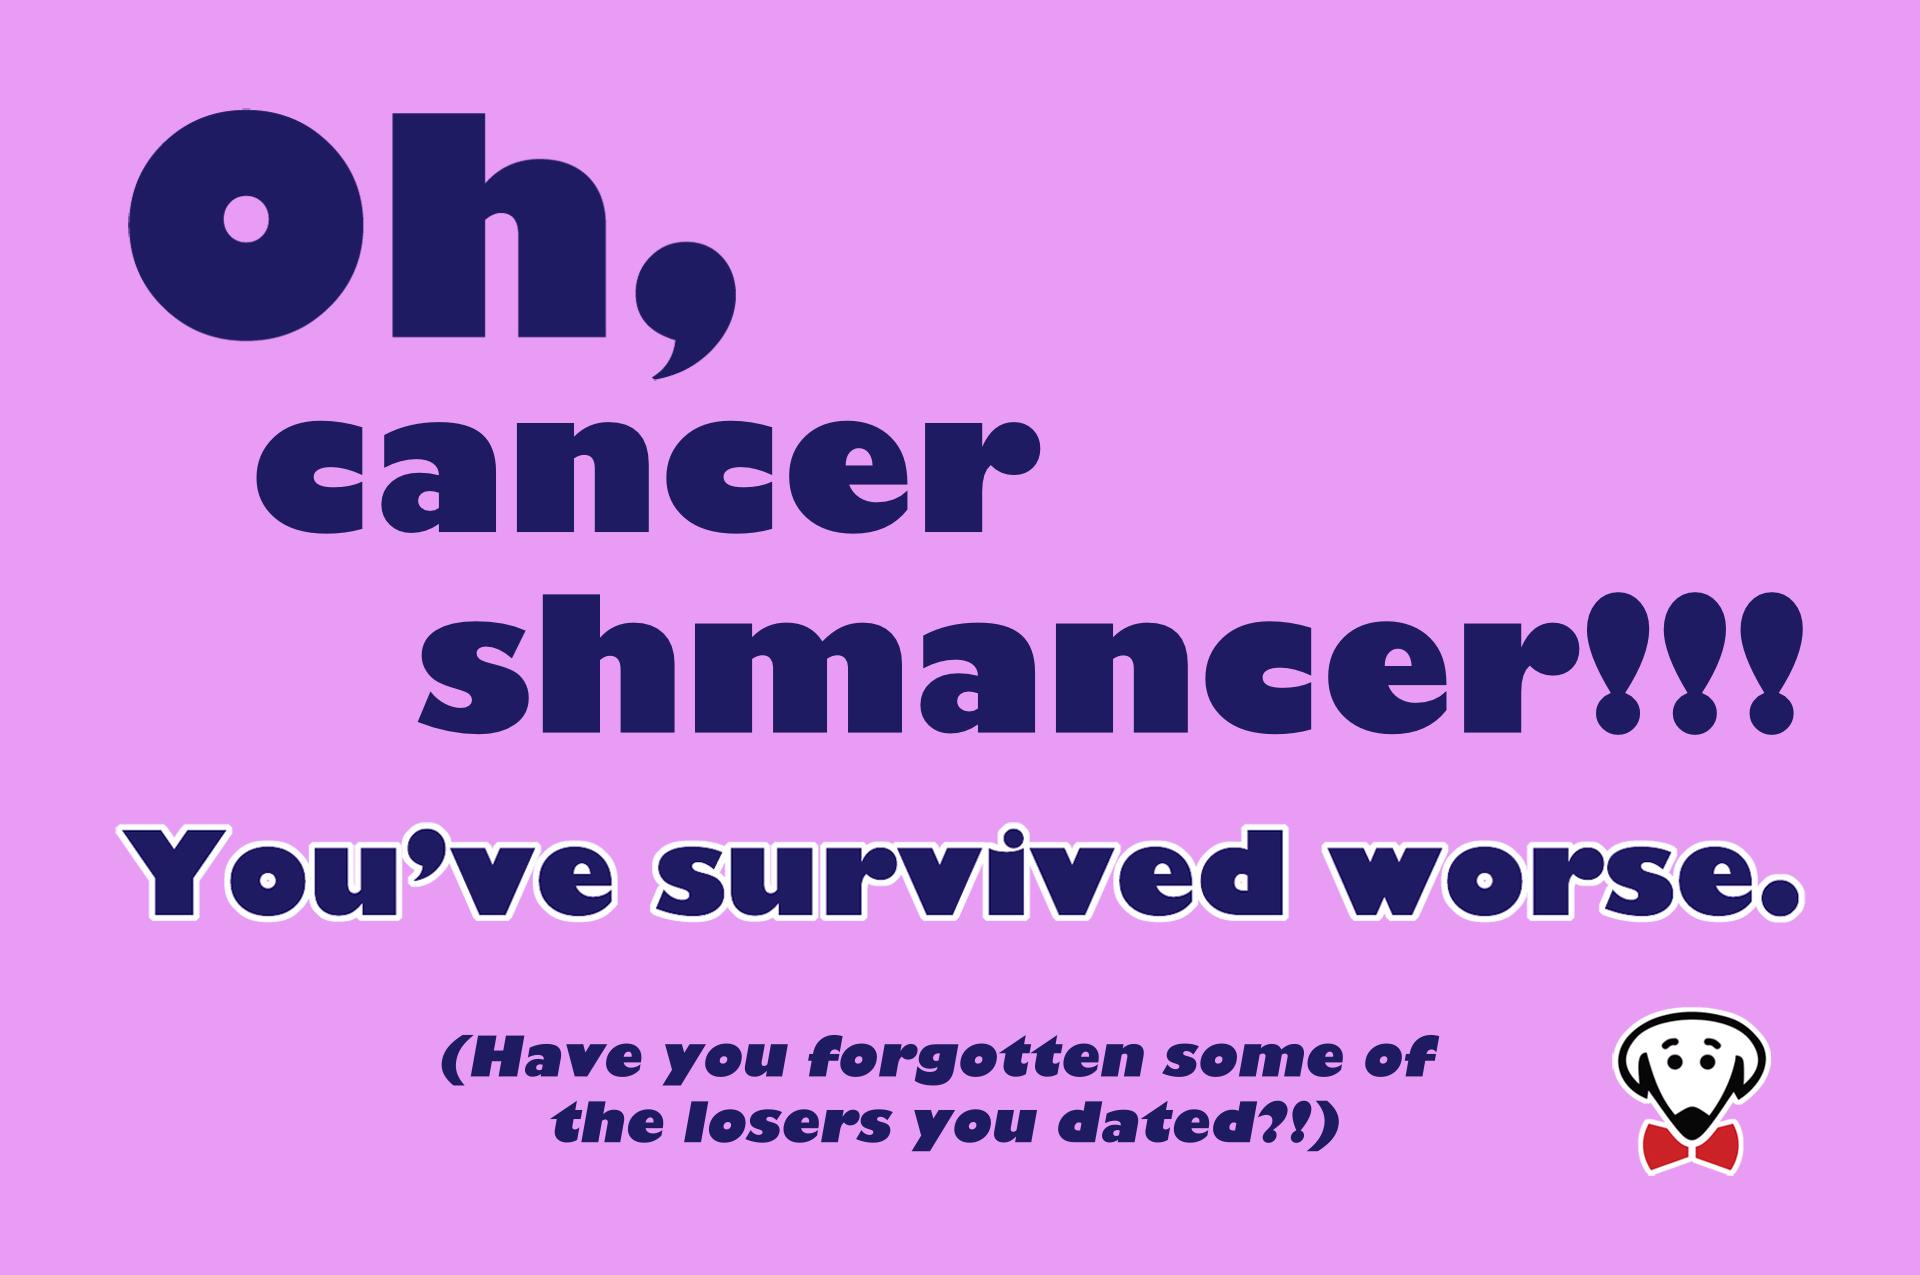 You've survived worse – large magnet